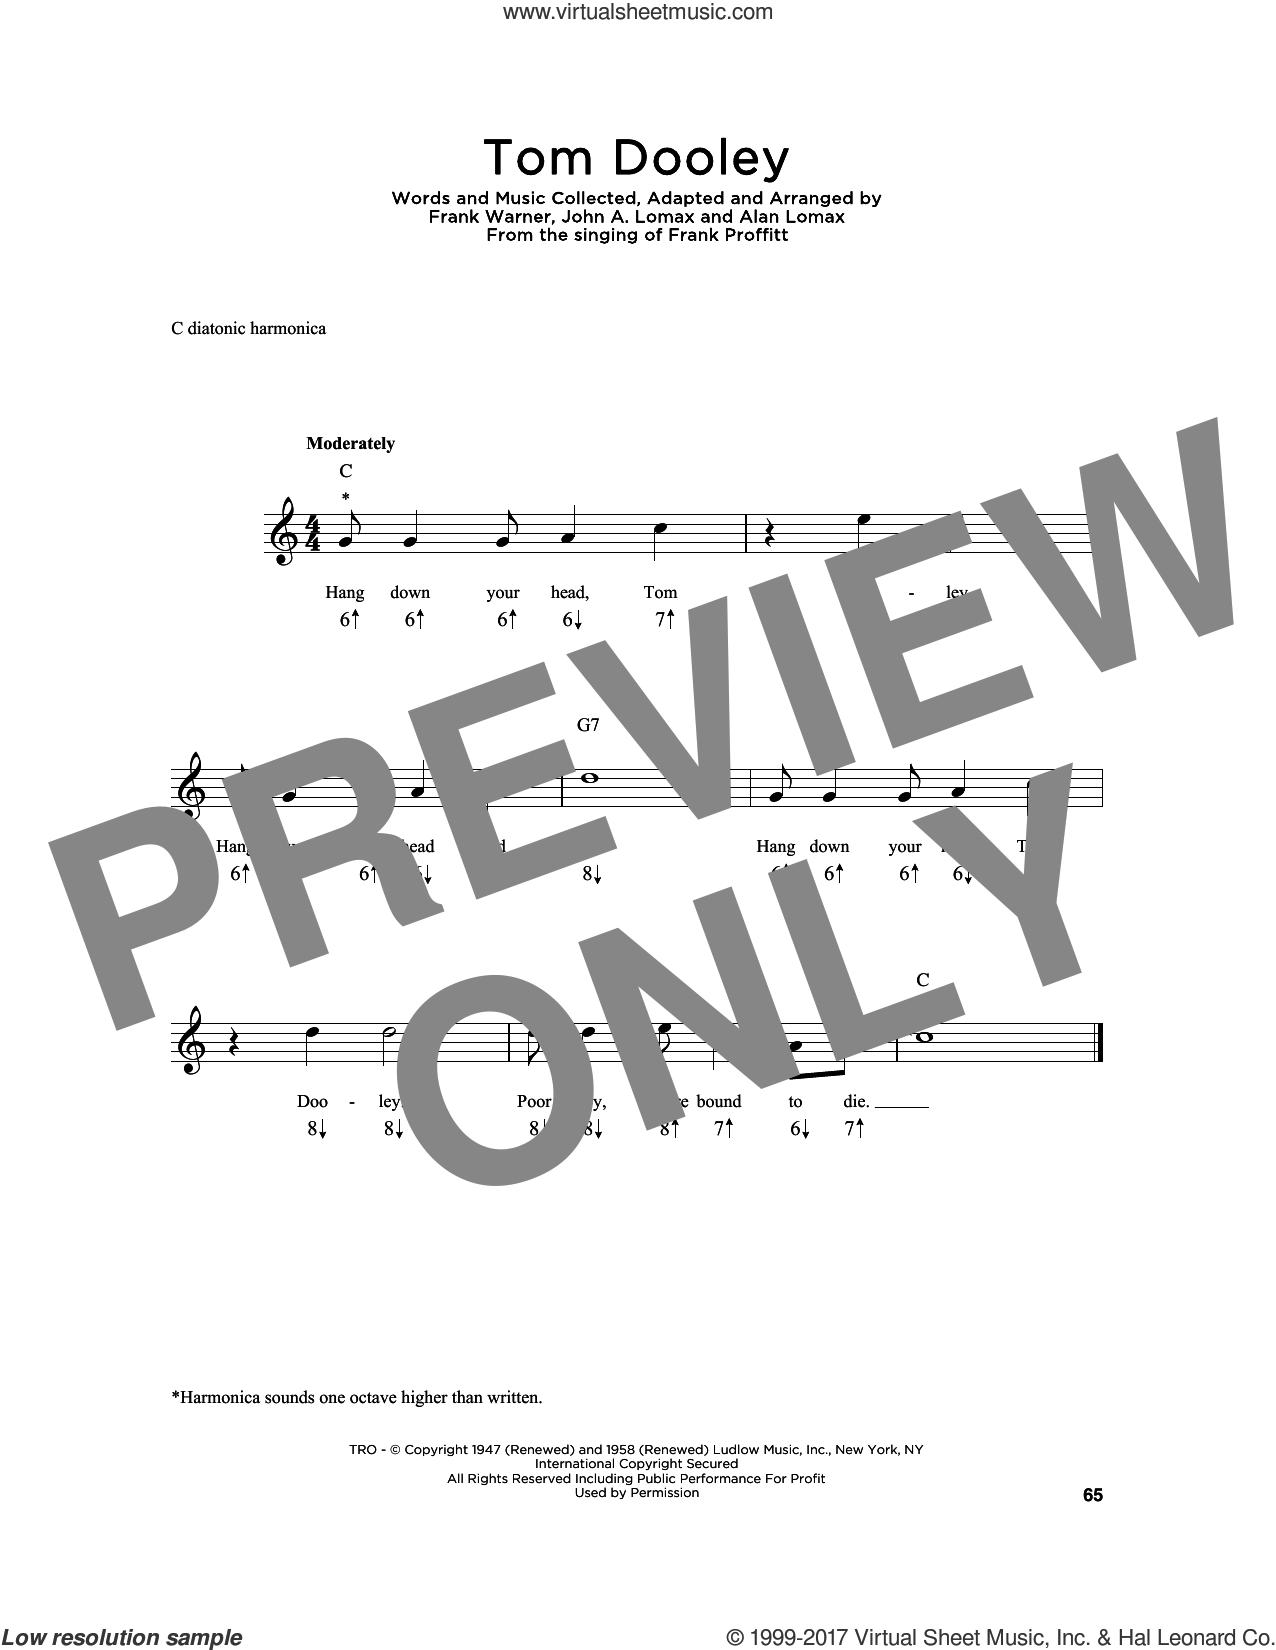 Tom Dooley sheet music for harmonica solo by Kingston Trio, Frank Warner and John A. Lomax, intermediate skill level